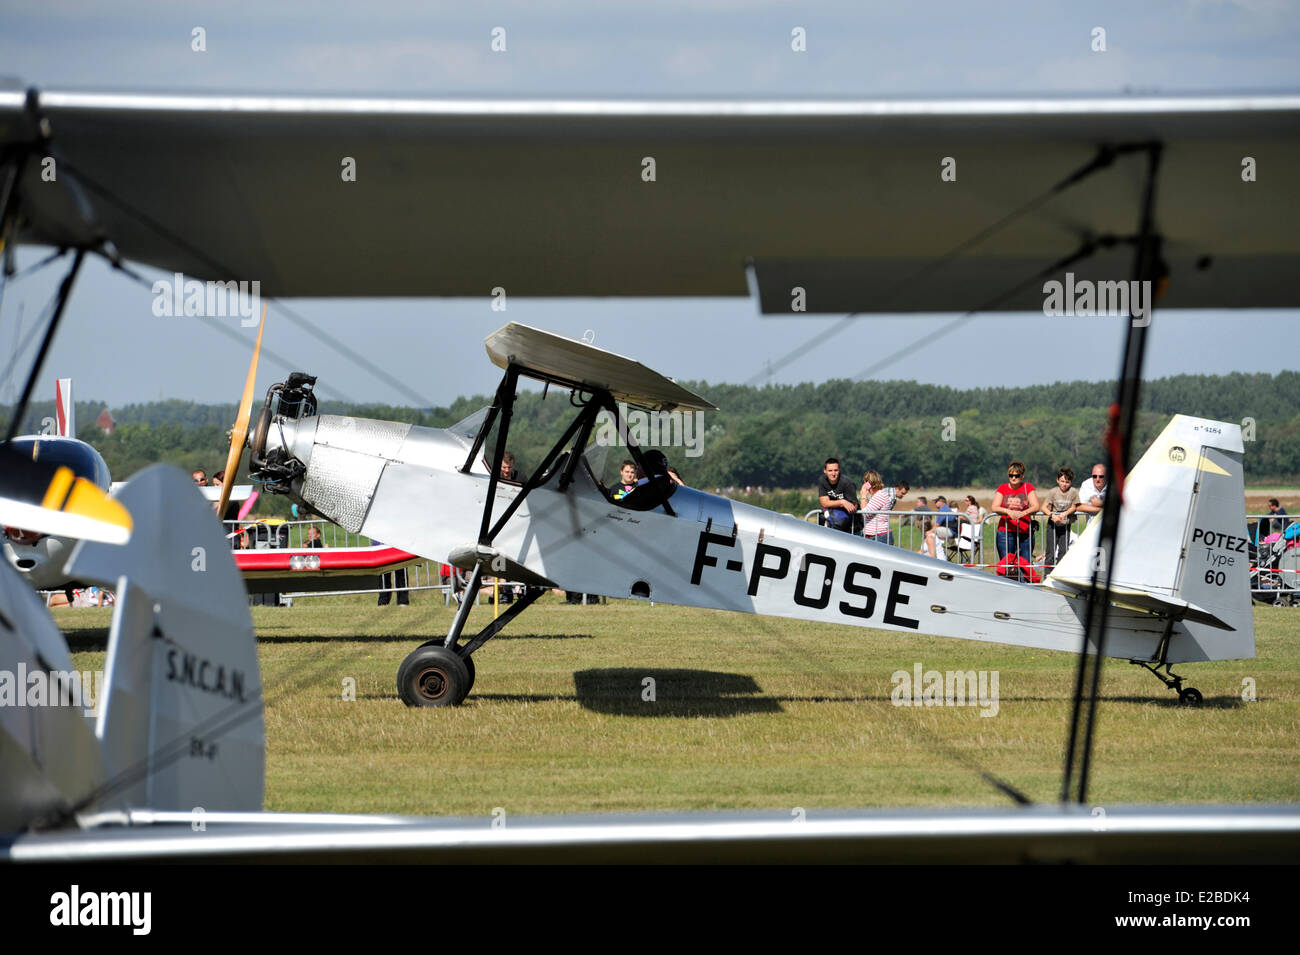 Francia, Pas de Calais, lente, aria incontro, biplano Potez tipo 60 sul terreno Immagini Stock